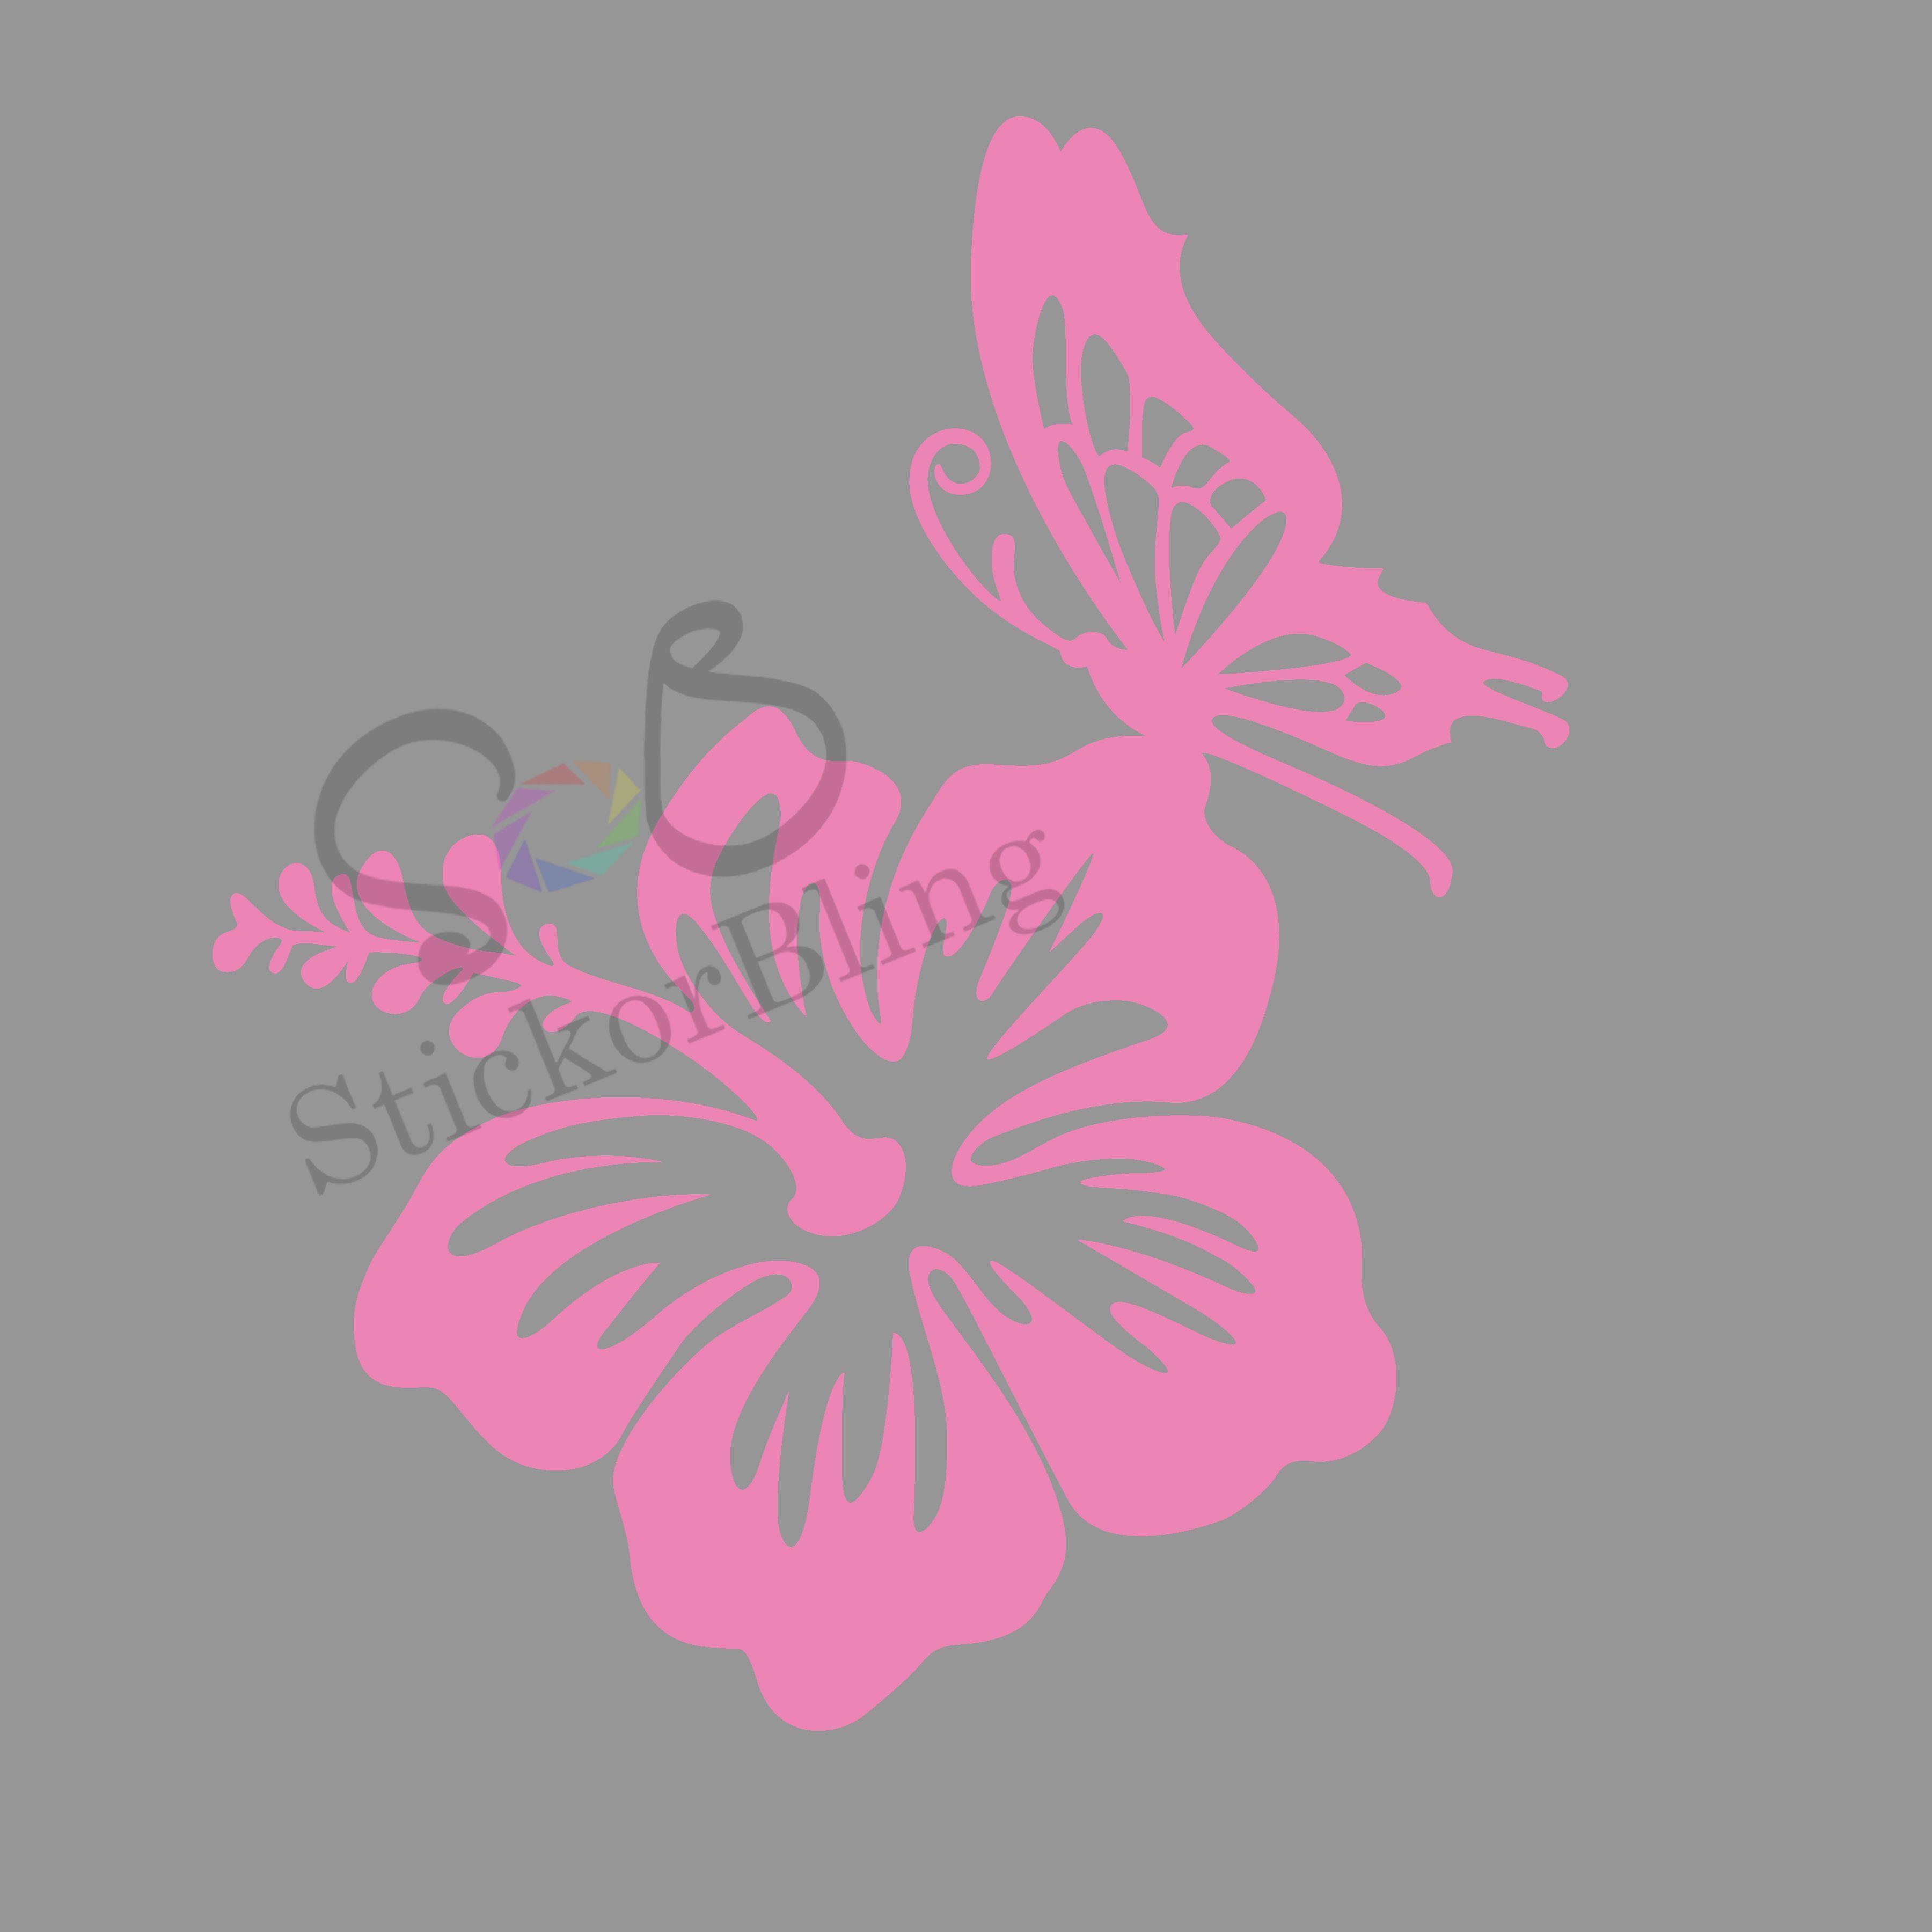 Hawaiian Hibiscus Flower Butterfly Vinyl Decal Sticker Car Window Bumper Laptop Vinyl Decals Vinyl Decal Stickers Vinyl [ 3600 x 3600 Pixel ]